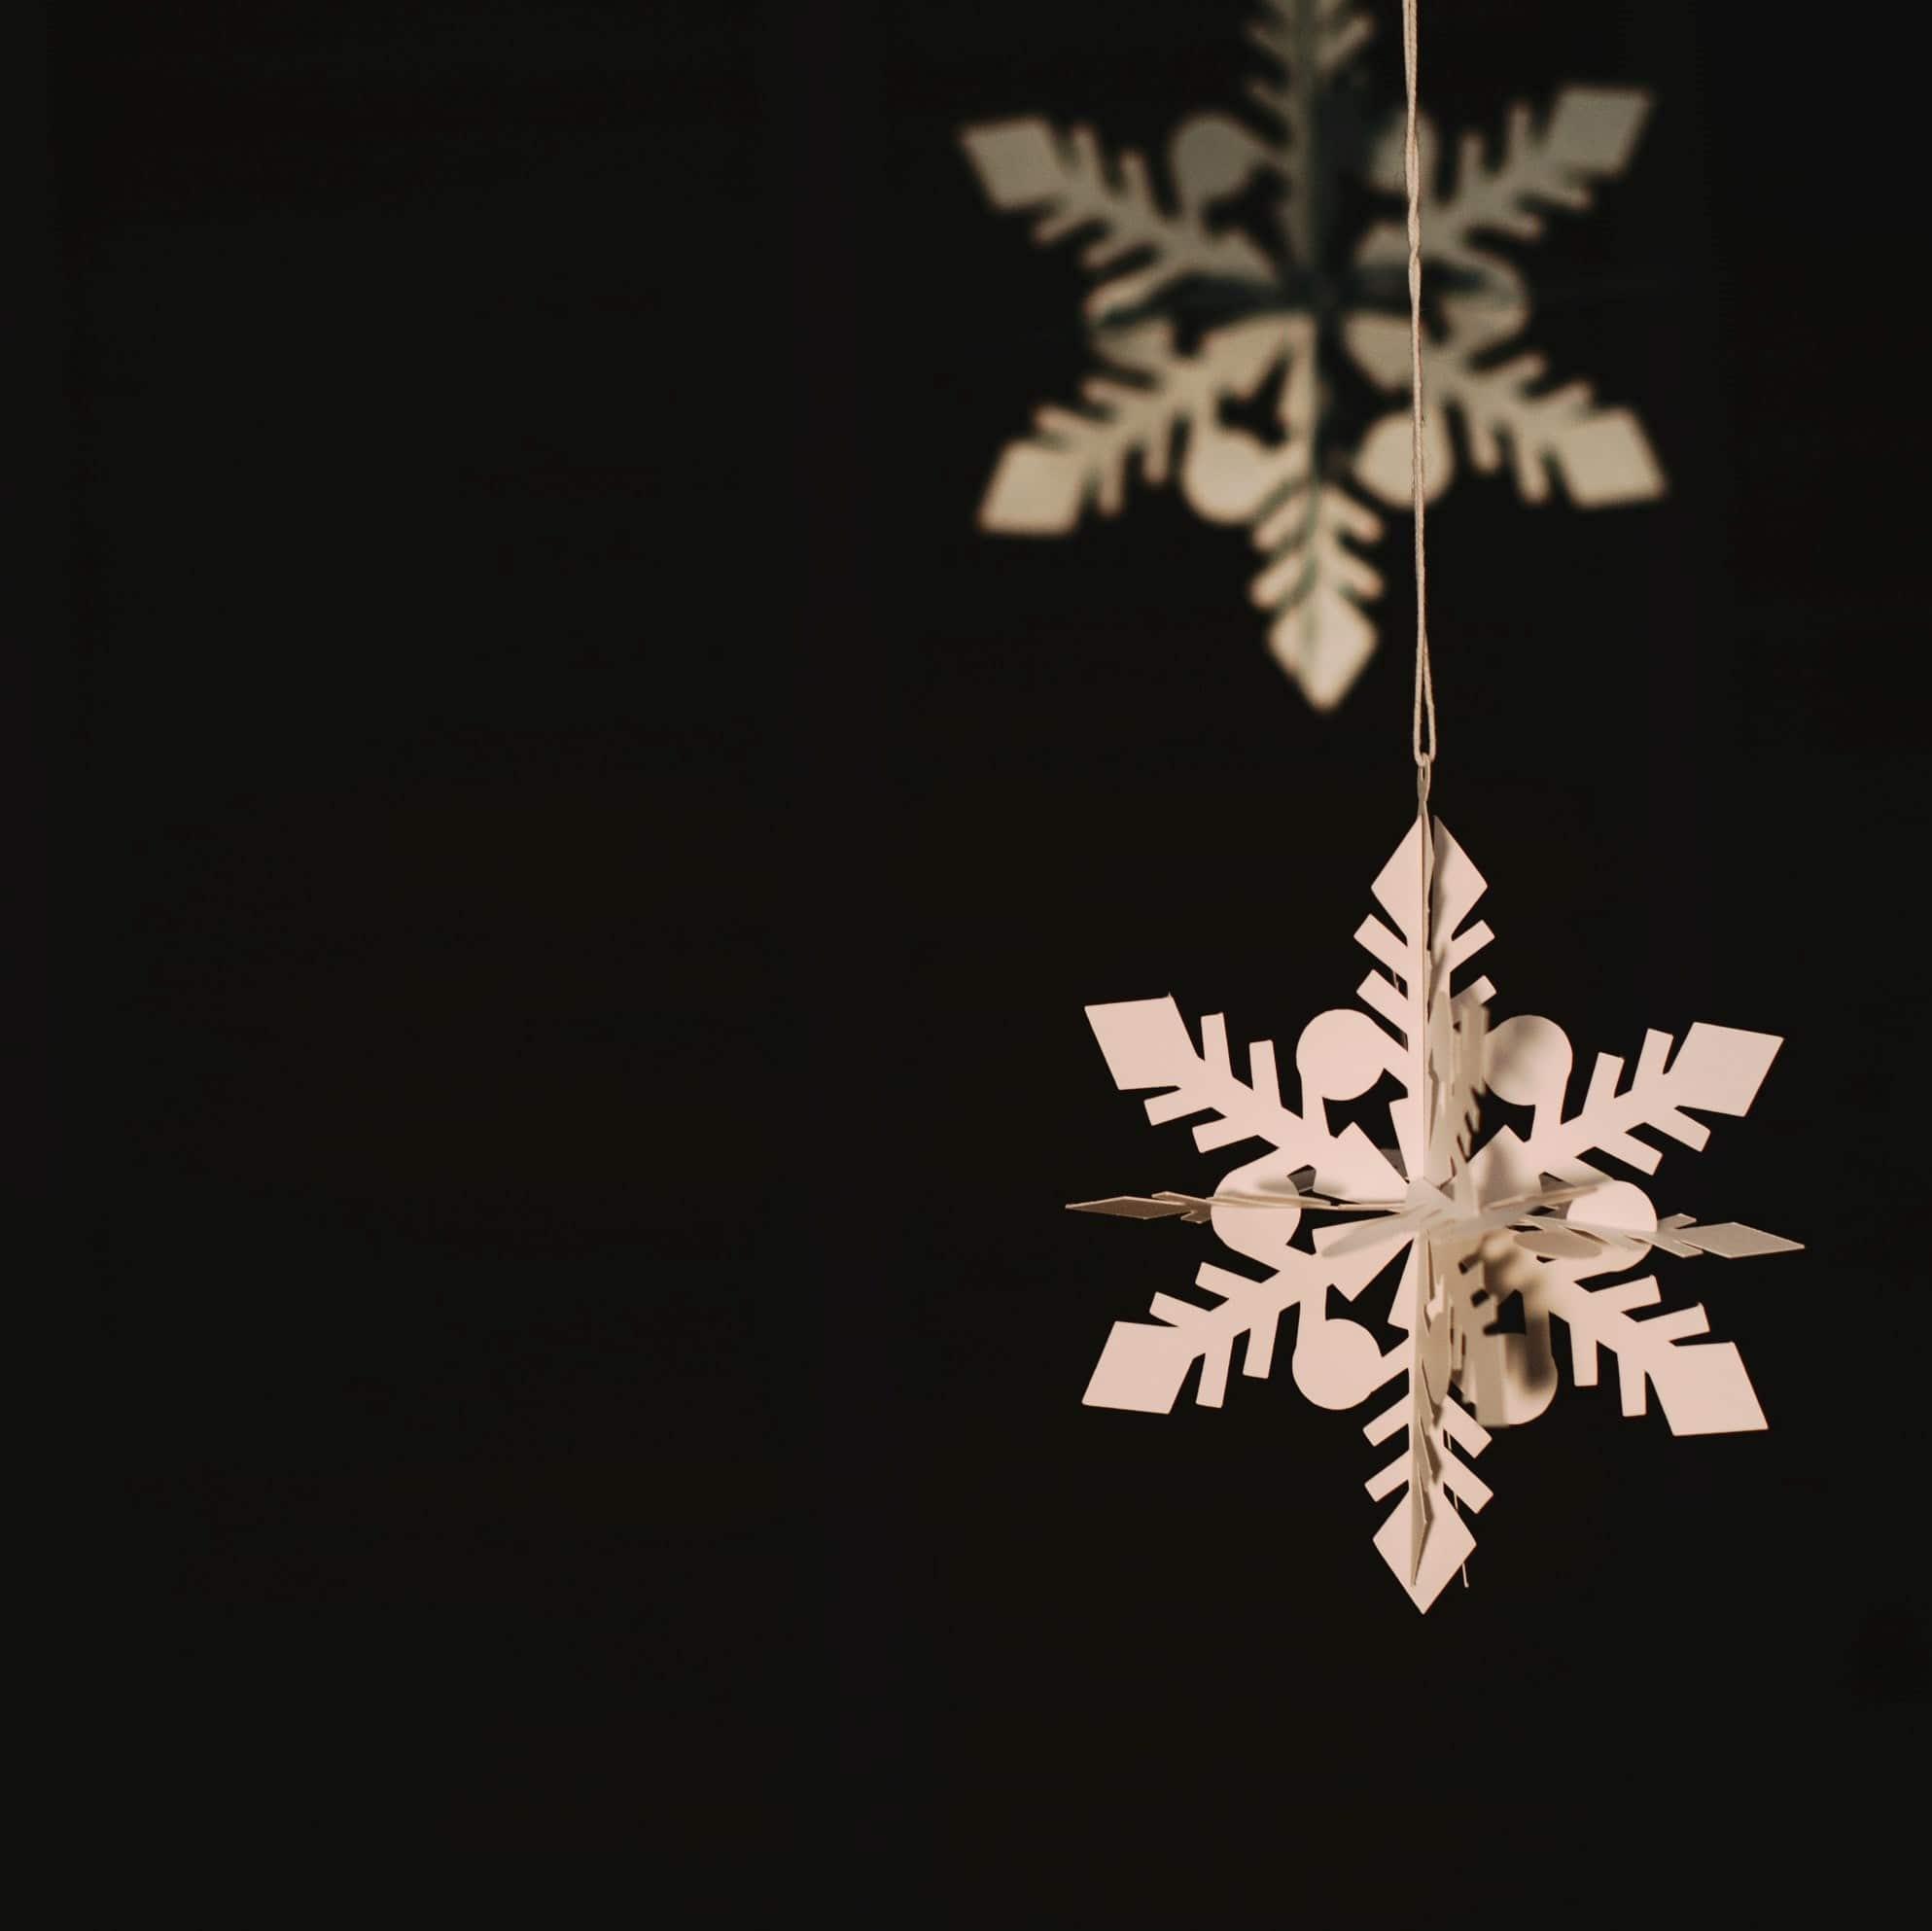 the joy of a simple Christmas